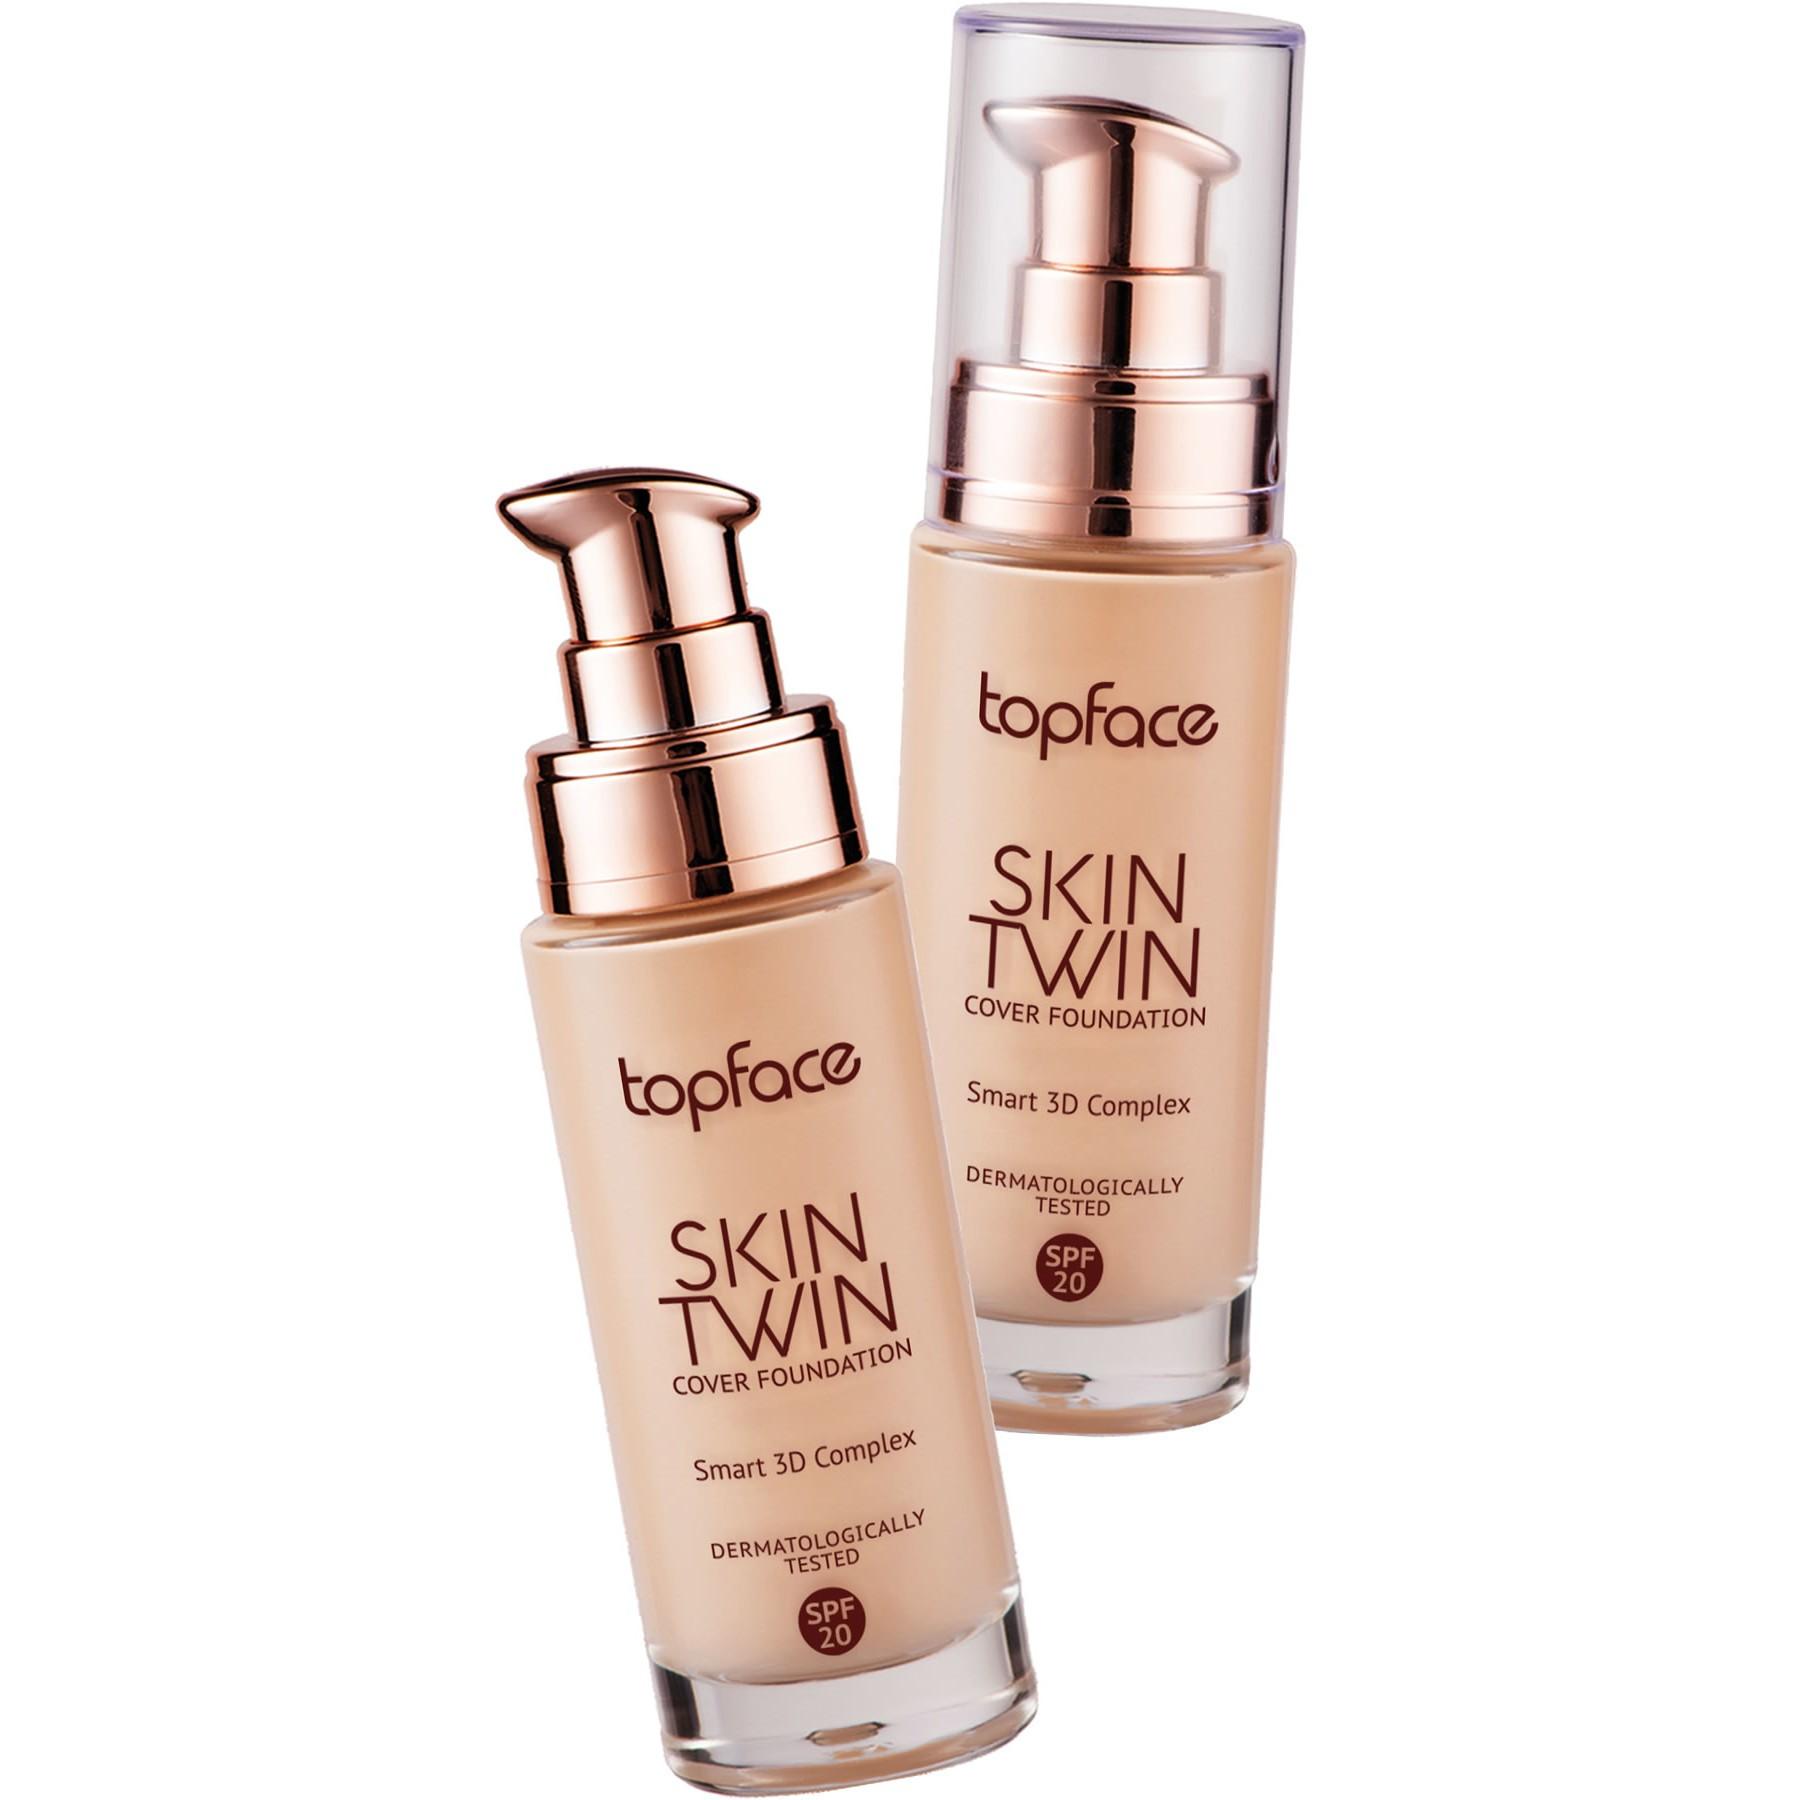 کرم پودر شیشه ای اسکین توین تاپ فیس - Topface Skin Twin Cover Foundation